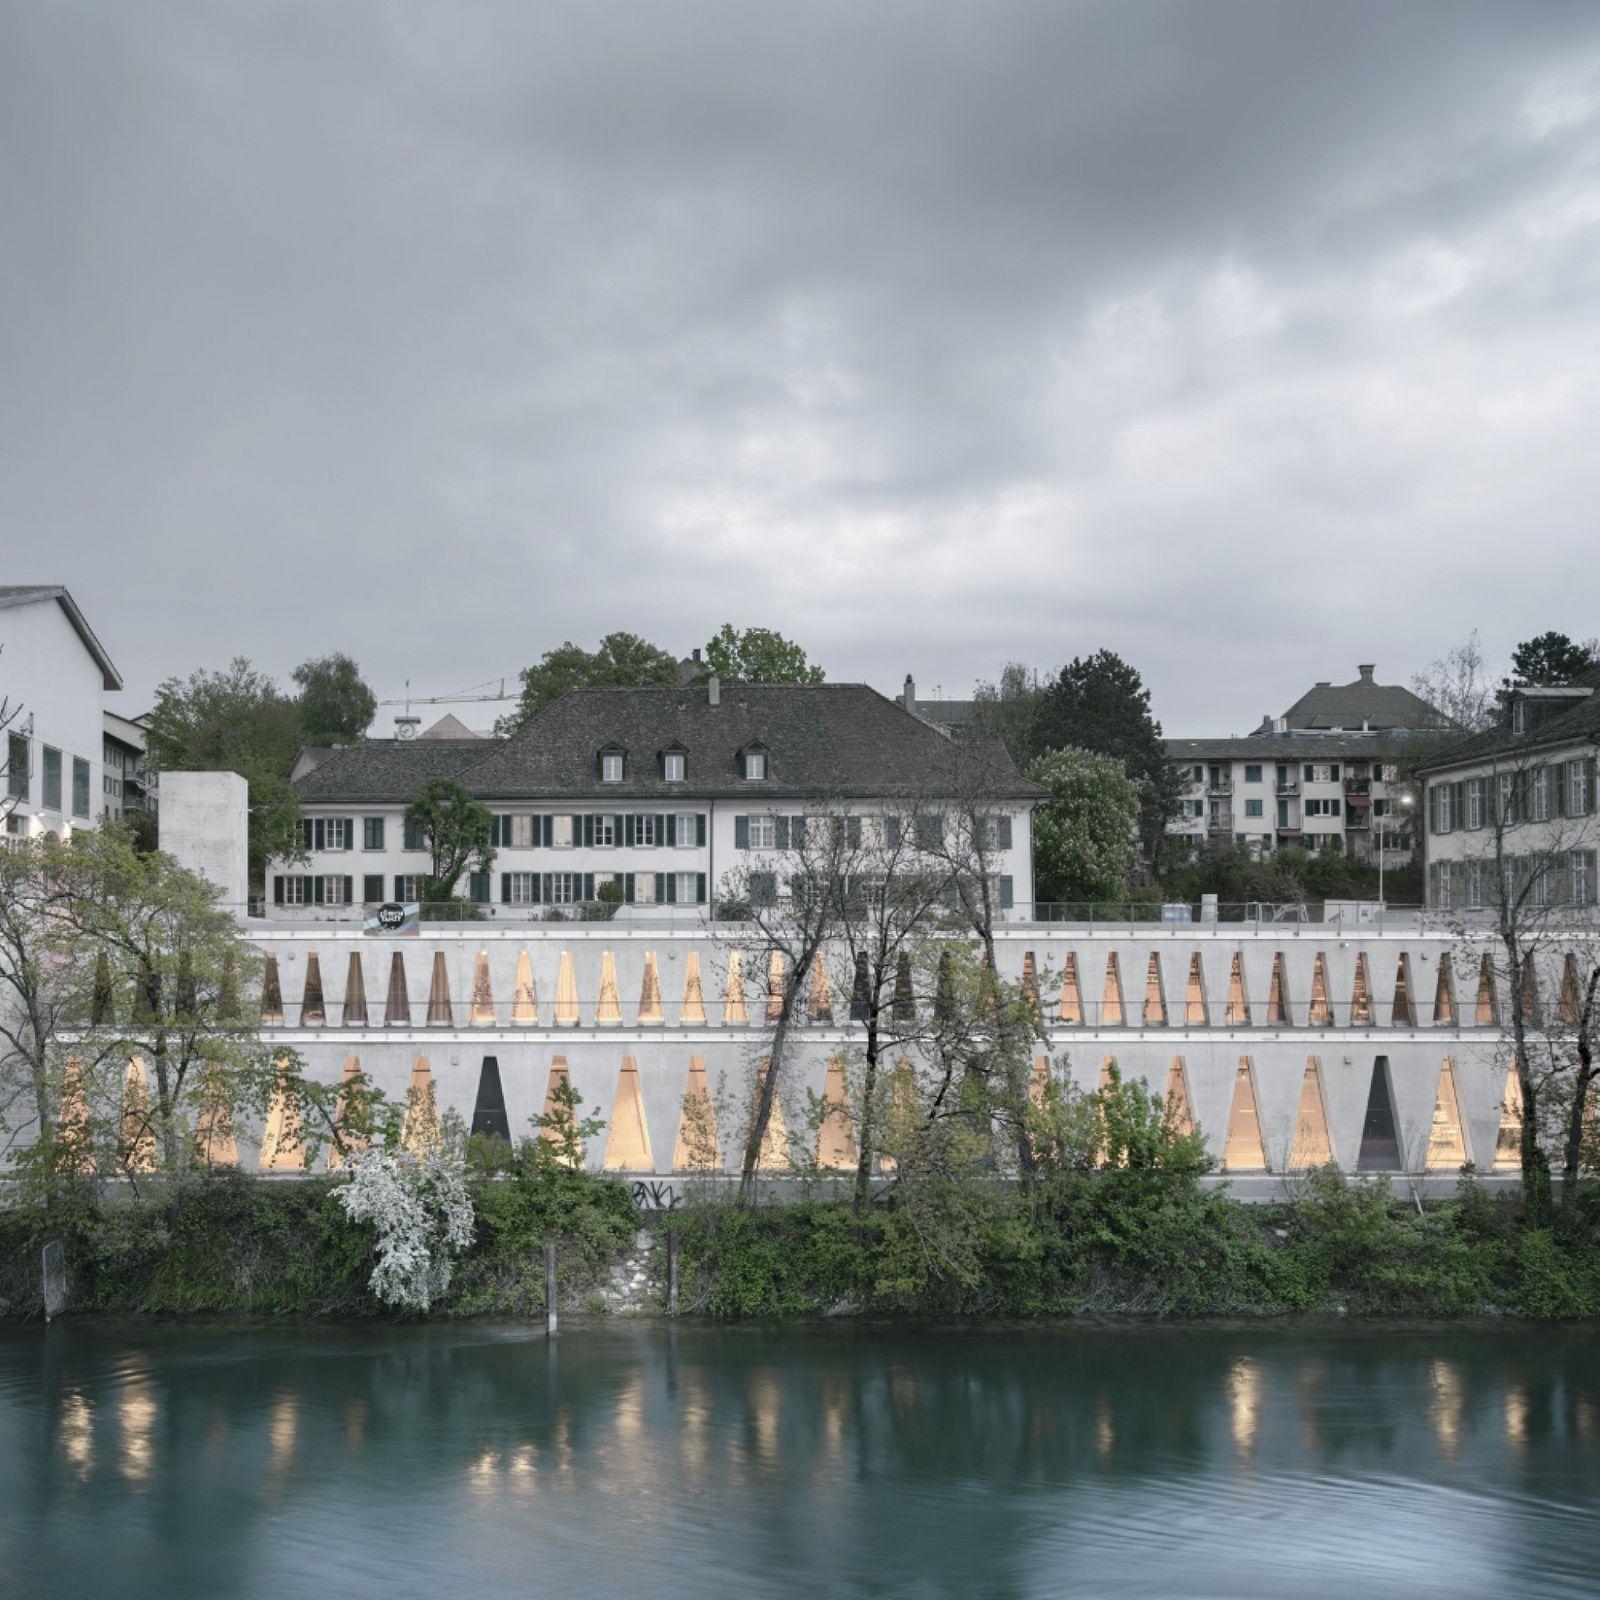 Tanzhaus Zürich by Barozzi Veiga GmbH